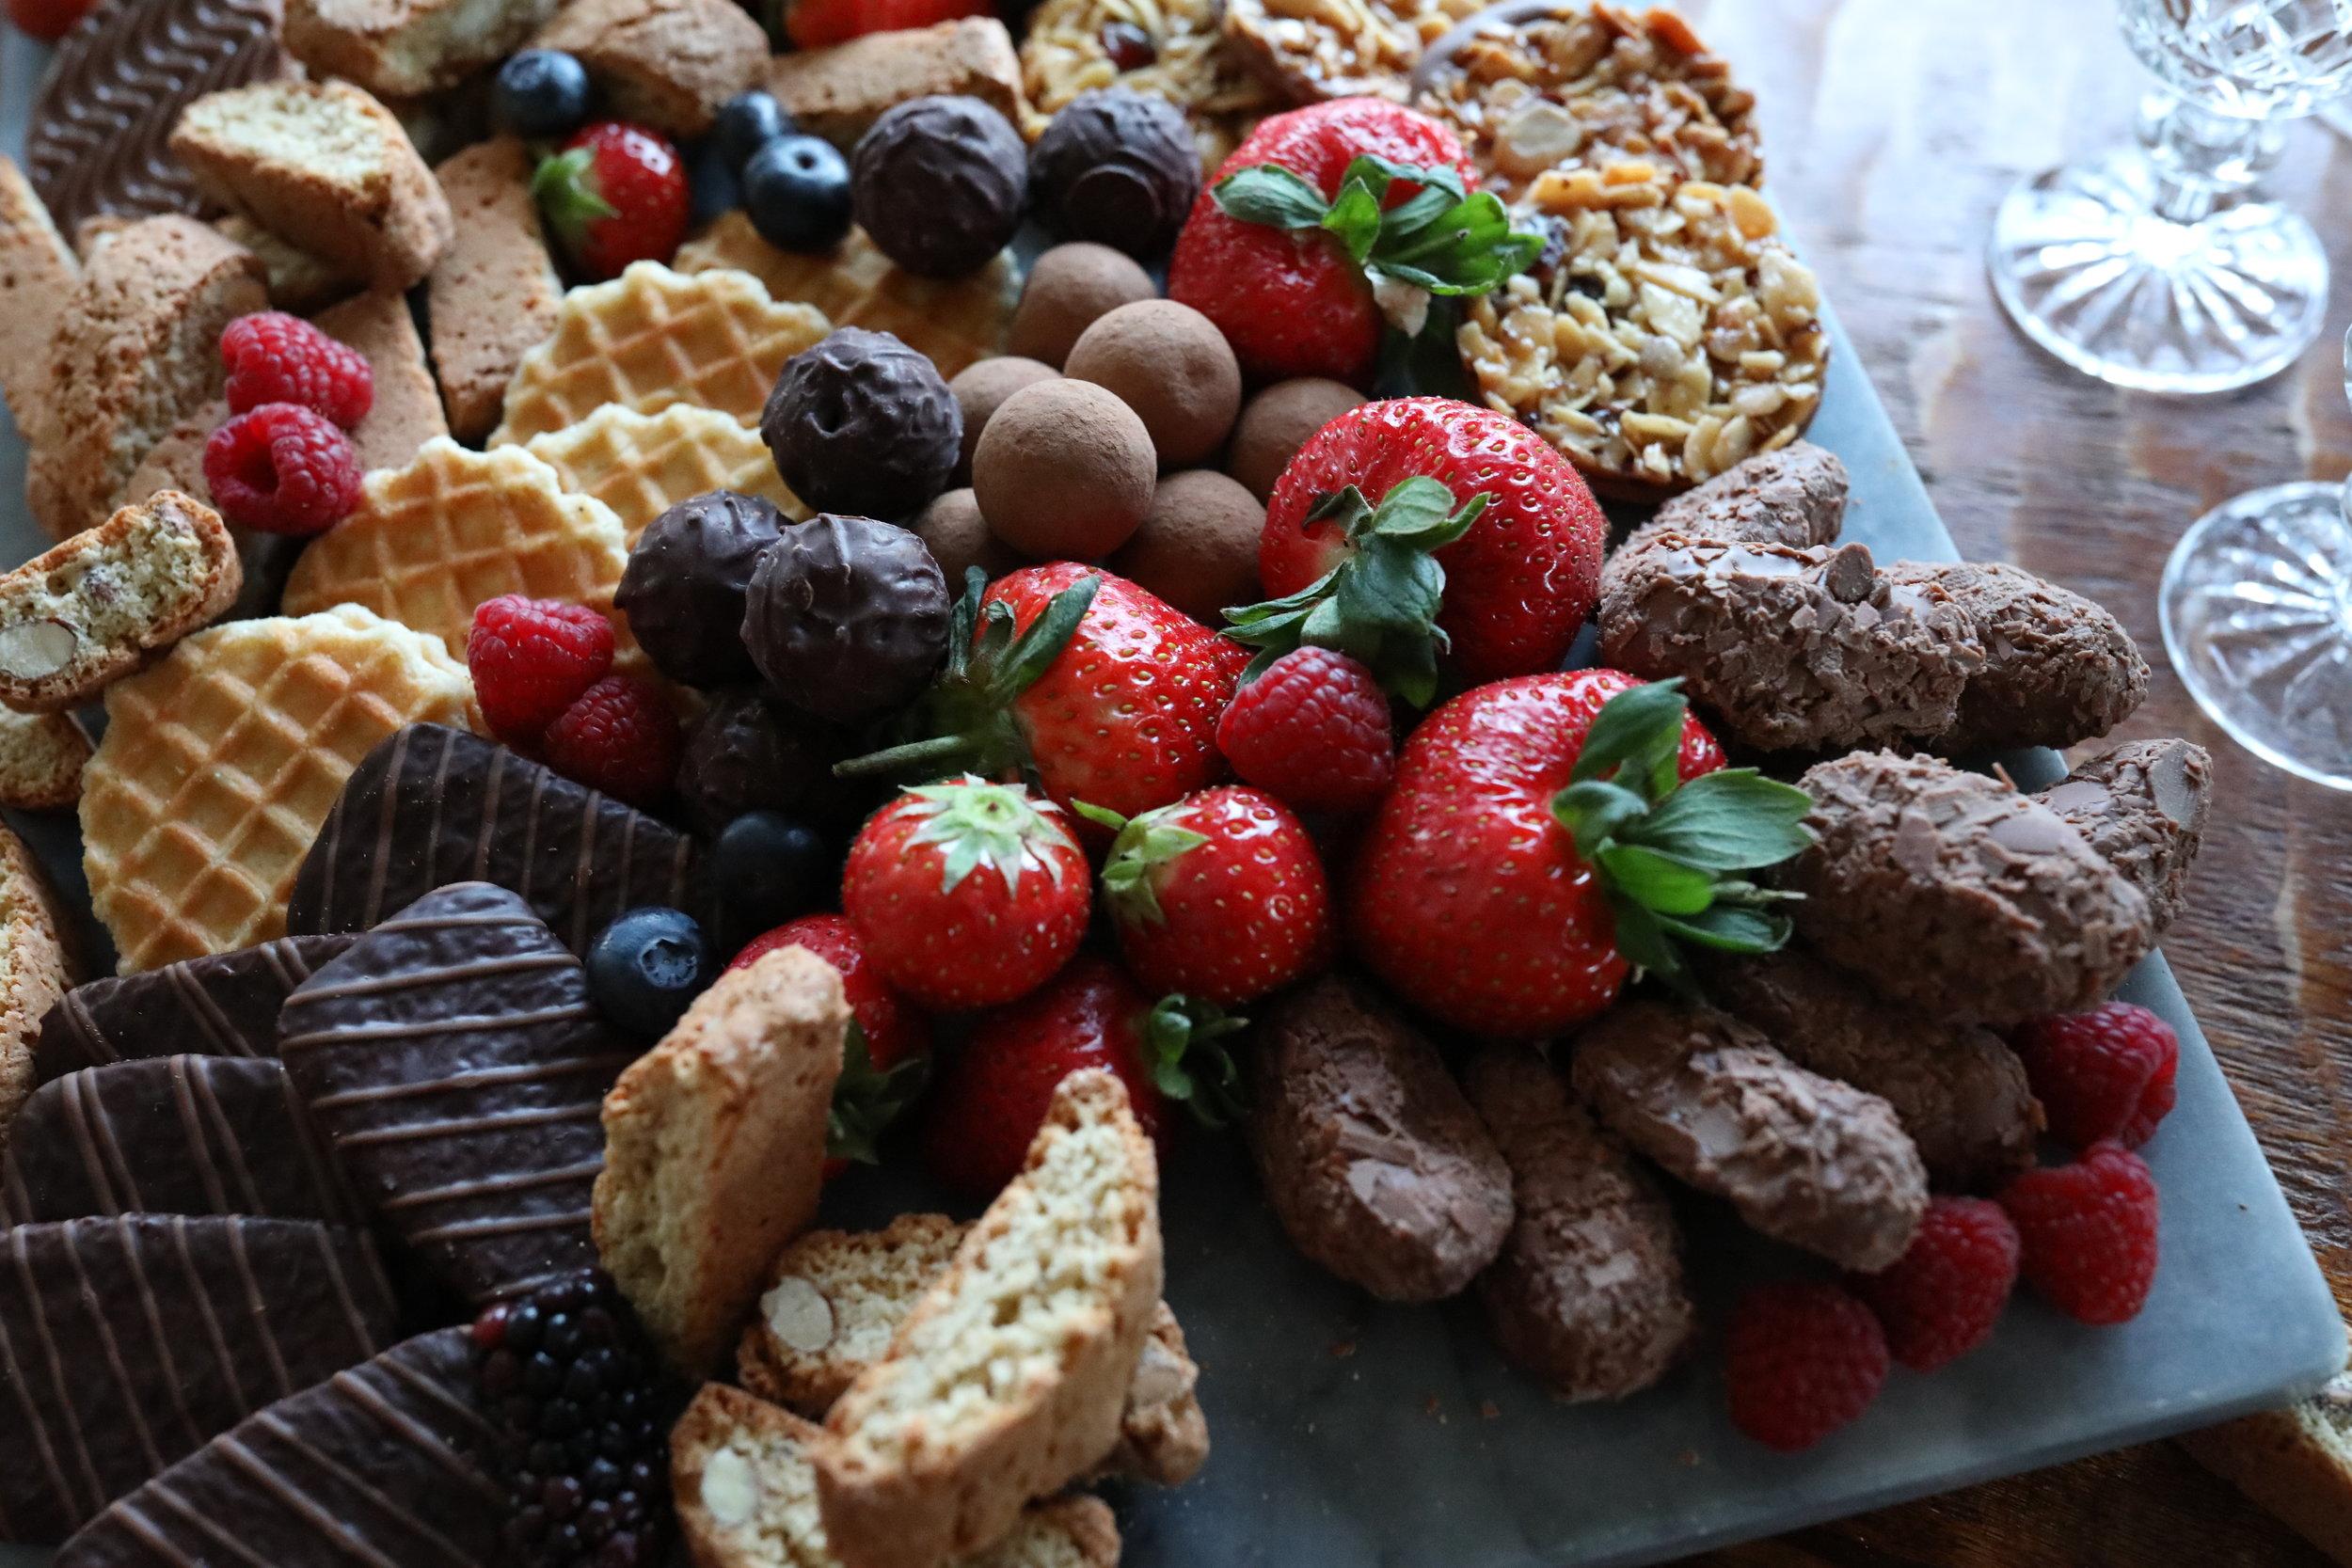 ASSORTED CHOCOLATES & FRUIT DESSERT BOARD